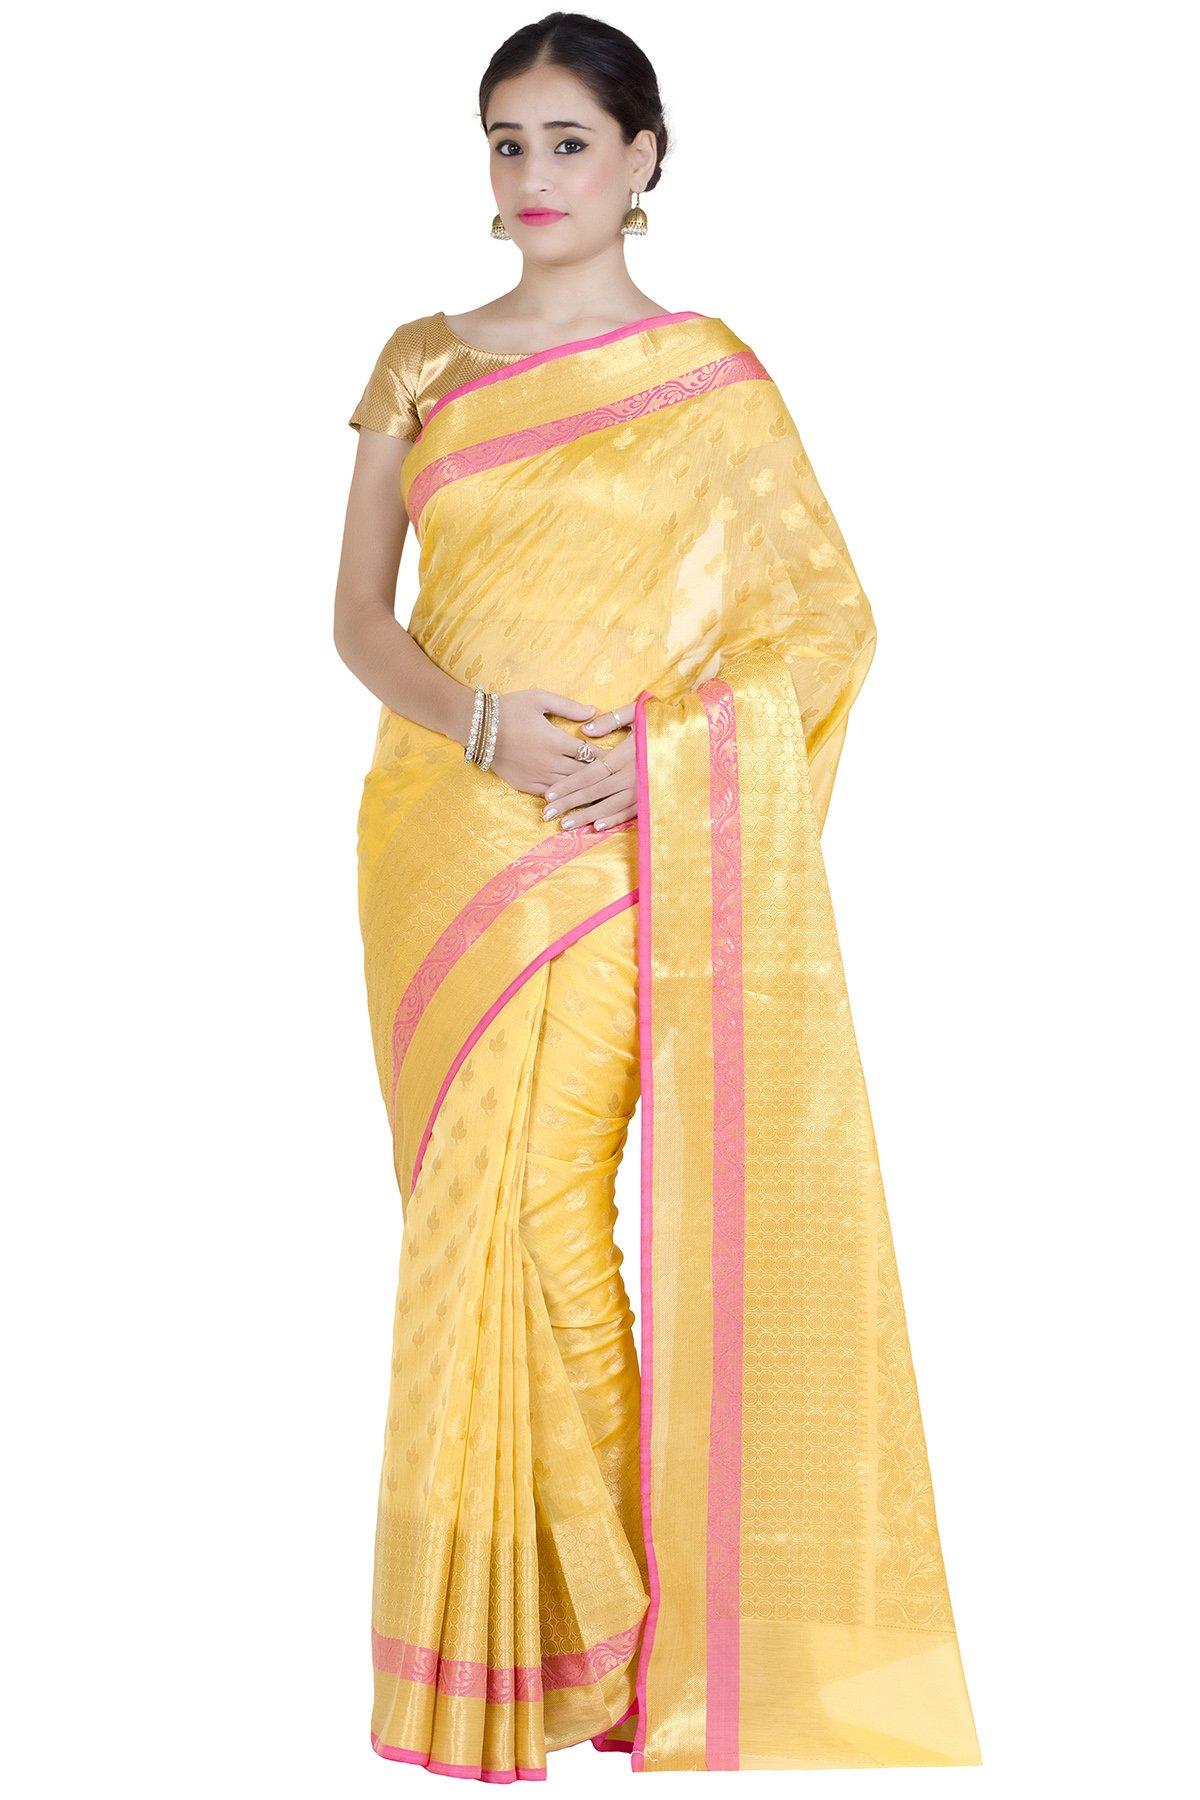 Chandrakala Women's Gold Cotton Silk Banarasi Saree